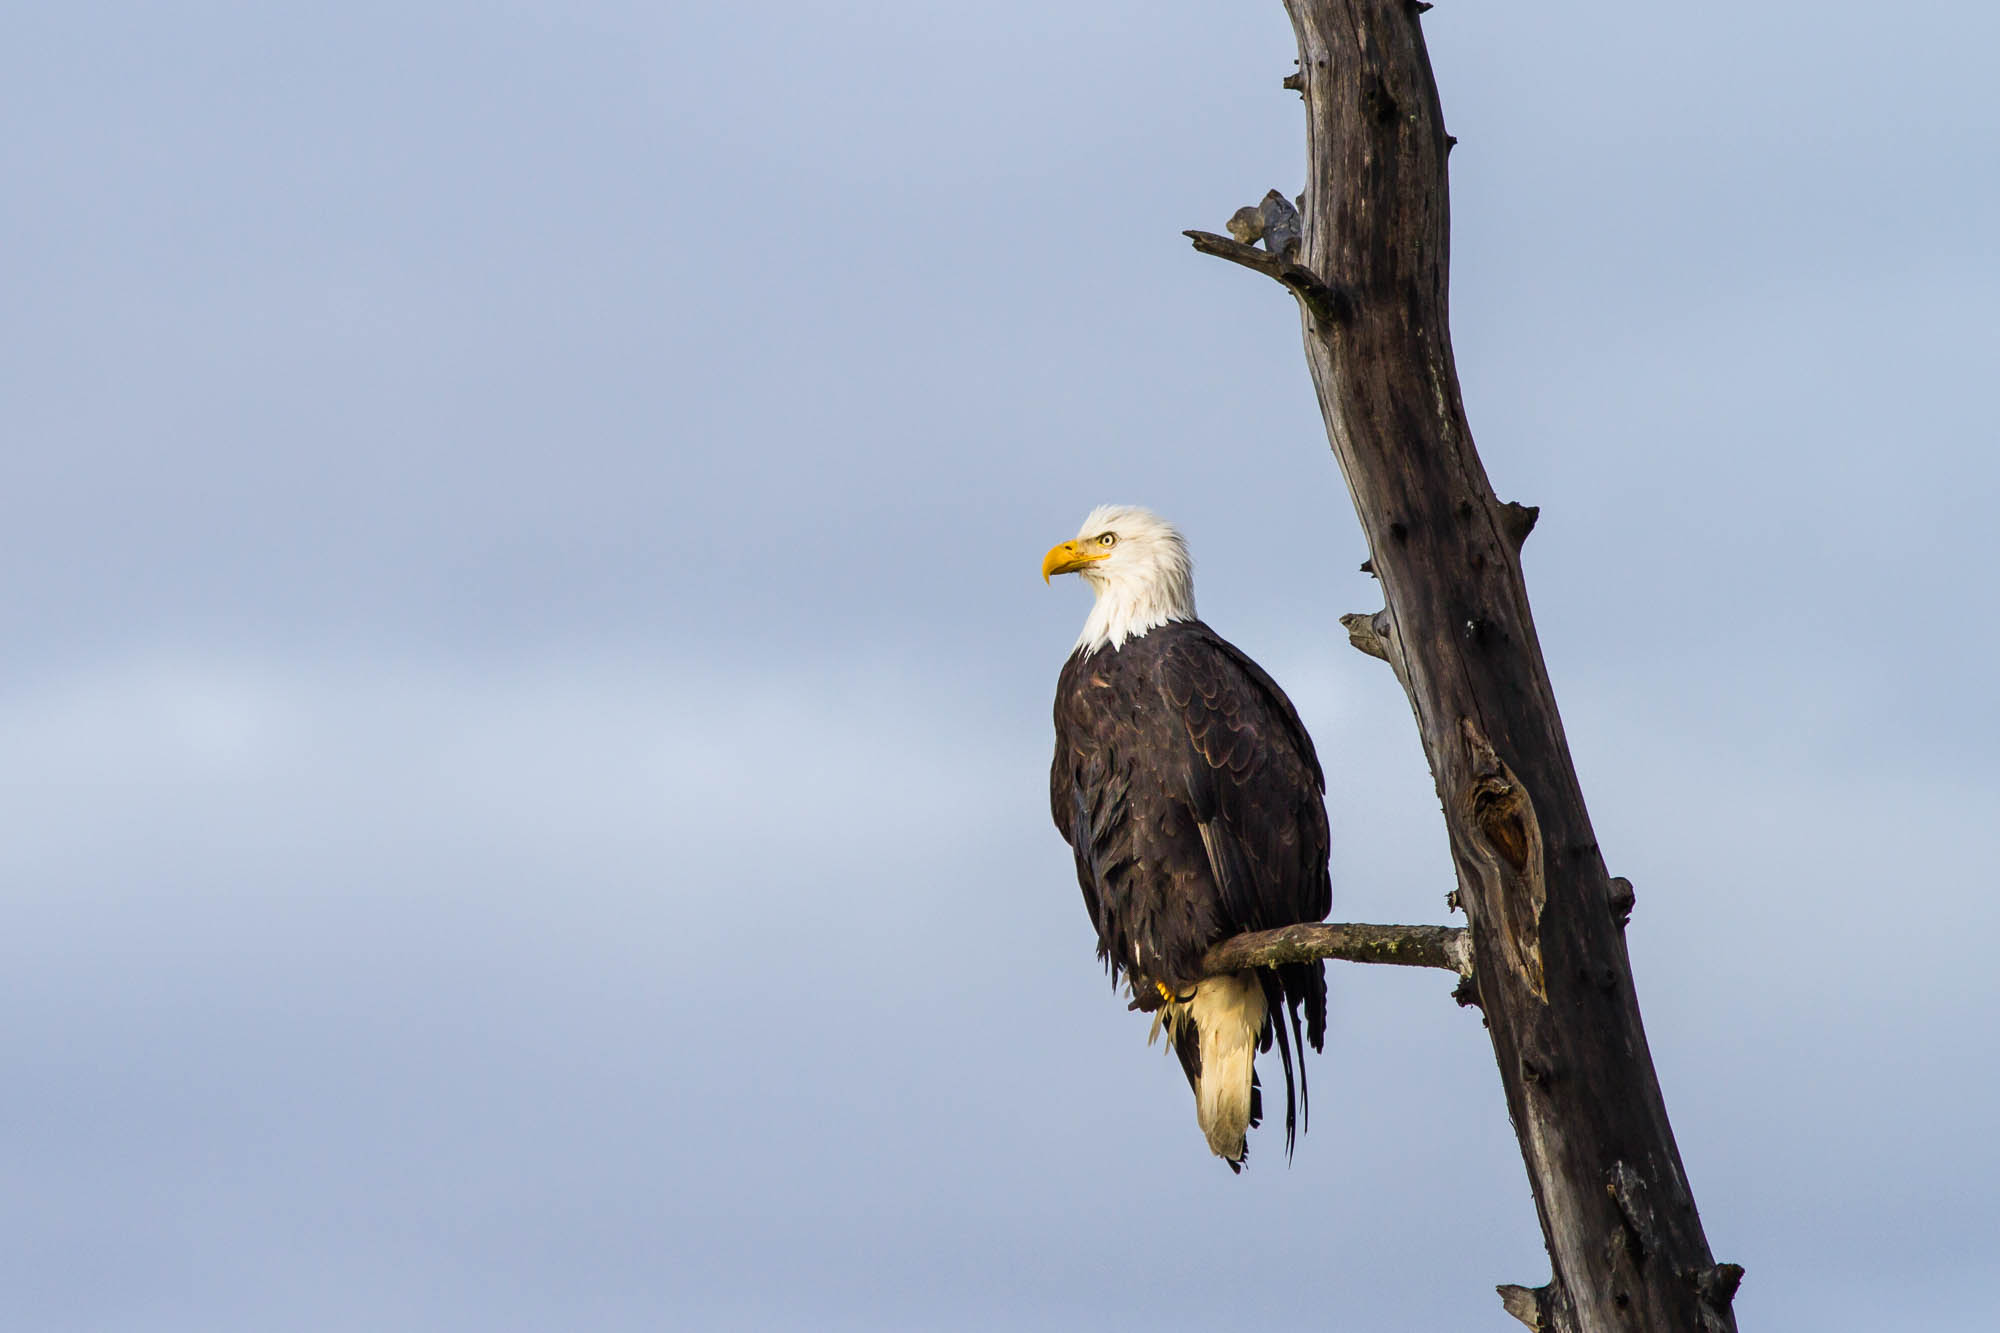 Alaska Chilkat Bald Eagle Preserve, Haines, Alaska, USA